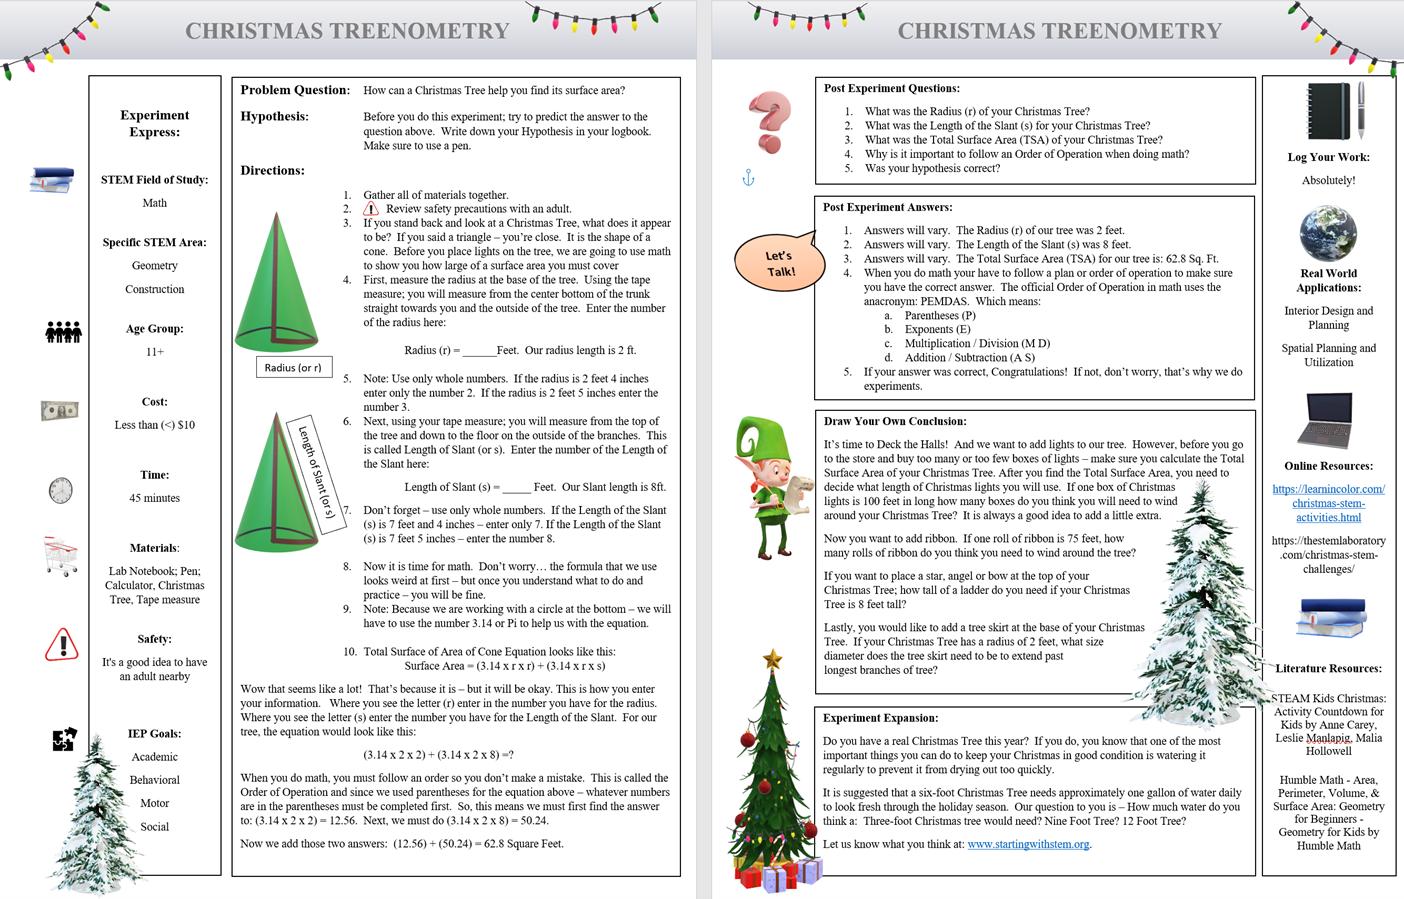 Winter STEM Christmas Treenometry.png